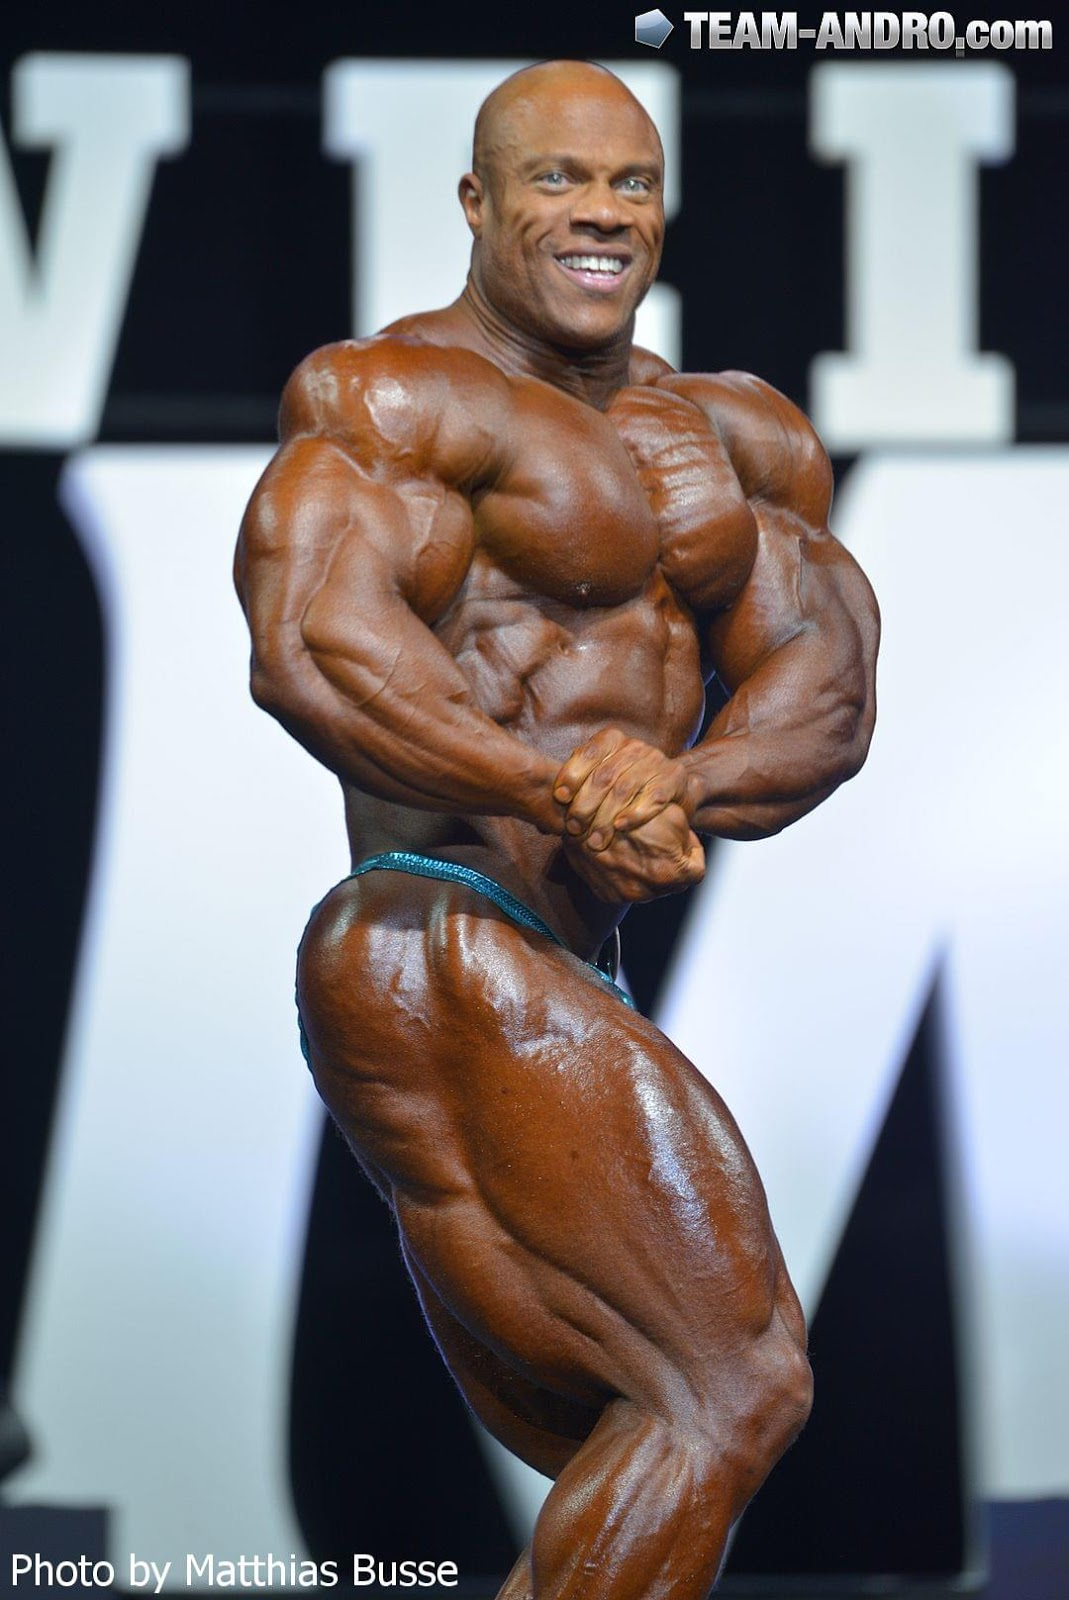 Muscle Ammiratore: MR. OLYMPIA 2017 ( CHAPTER 2+3 IFBB PRO